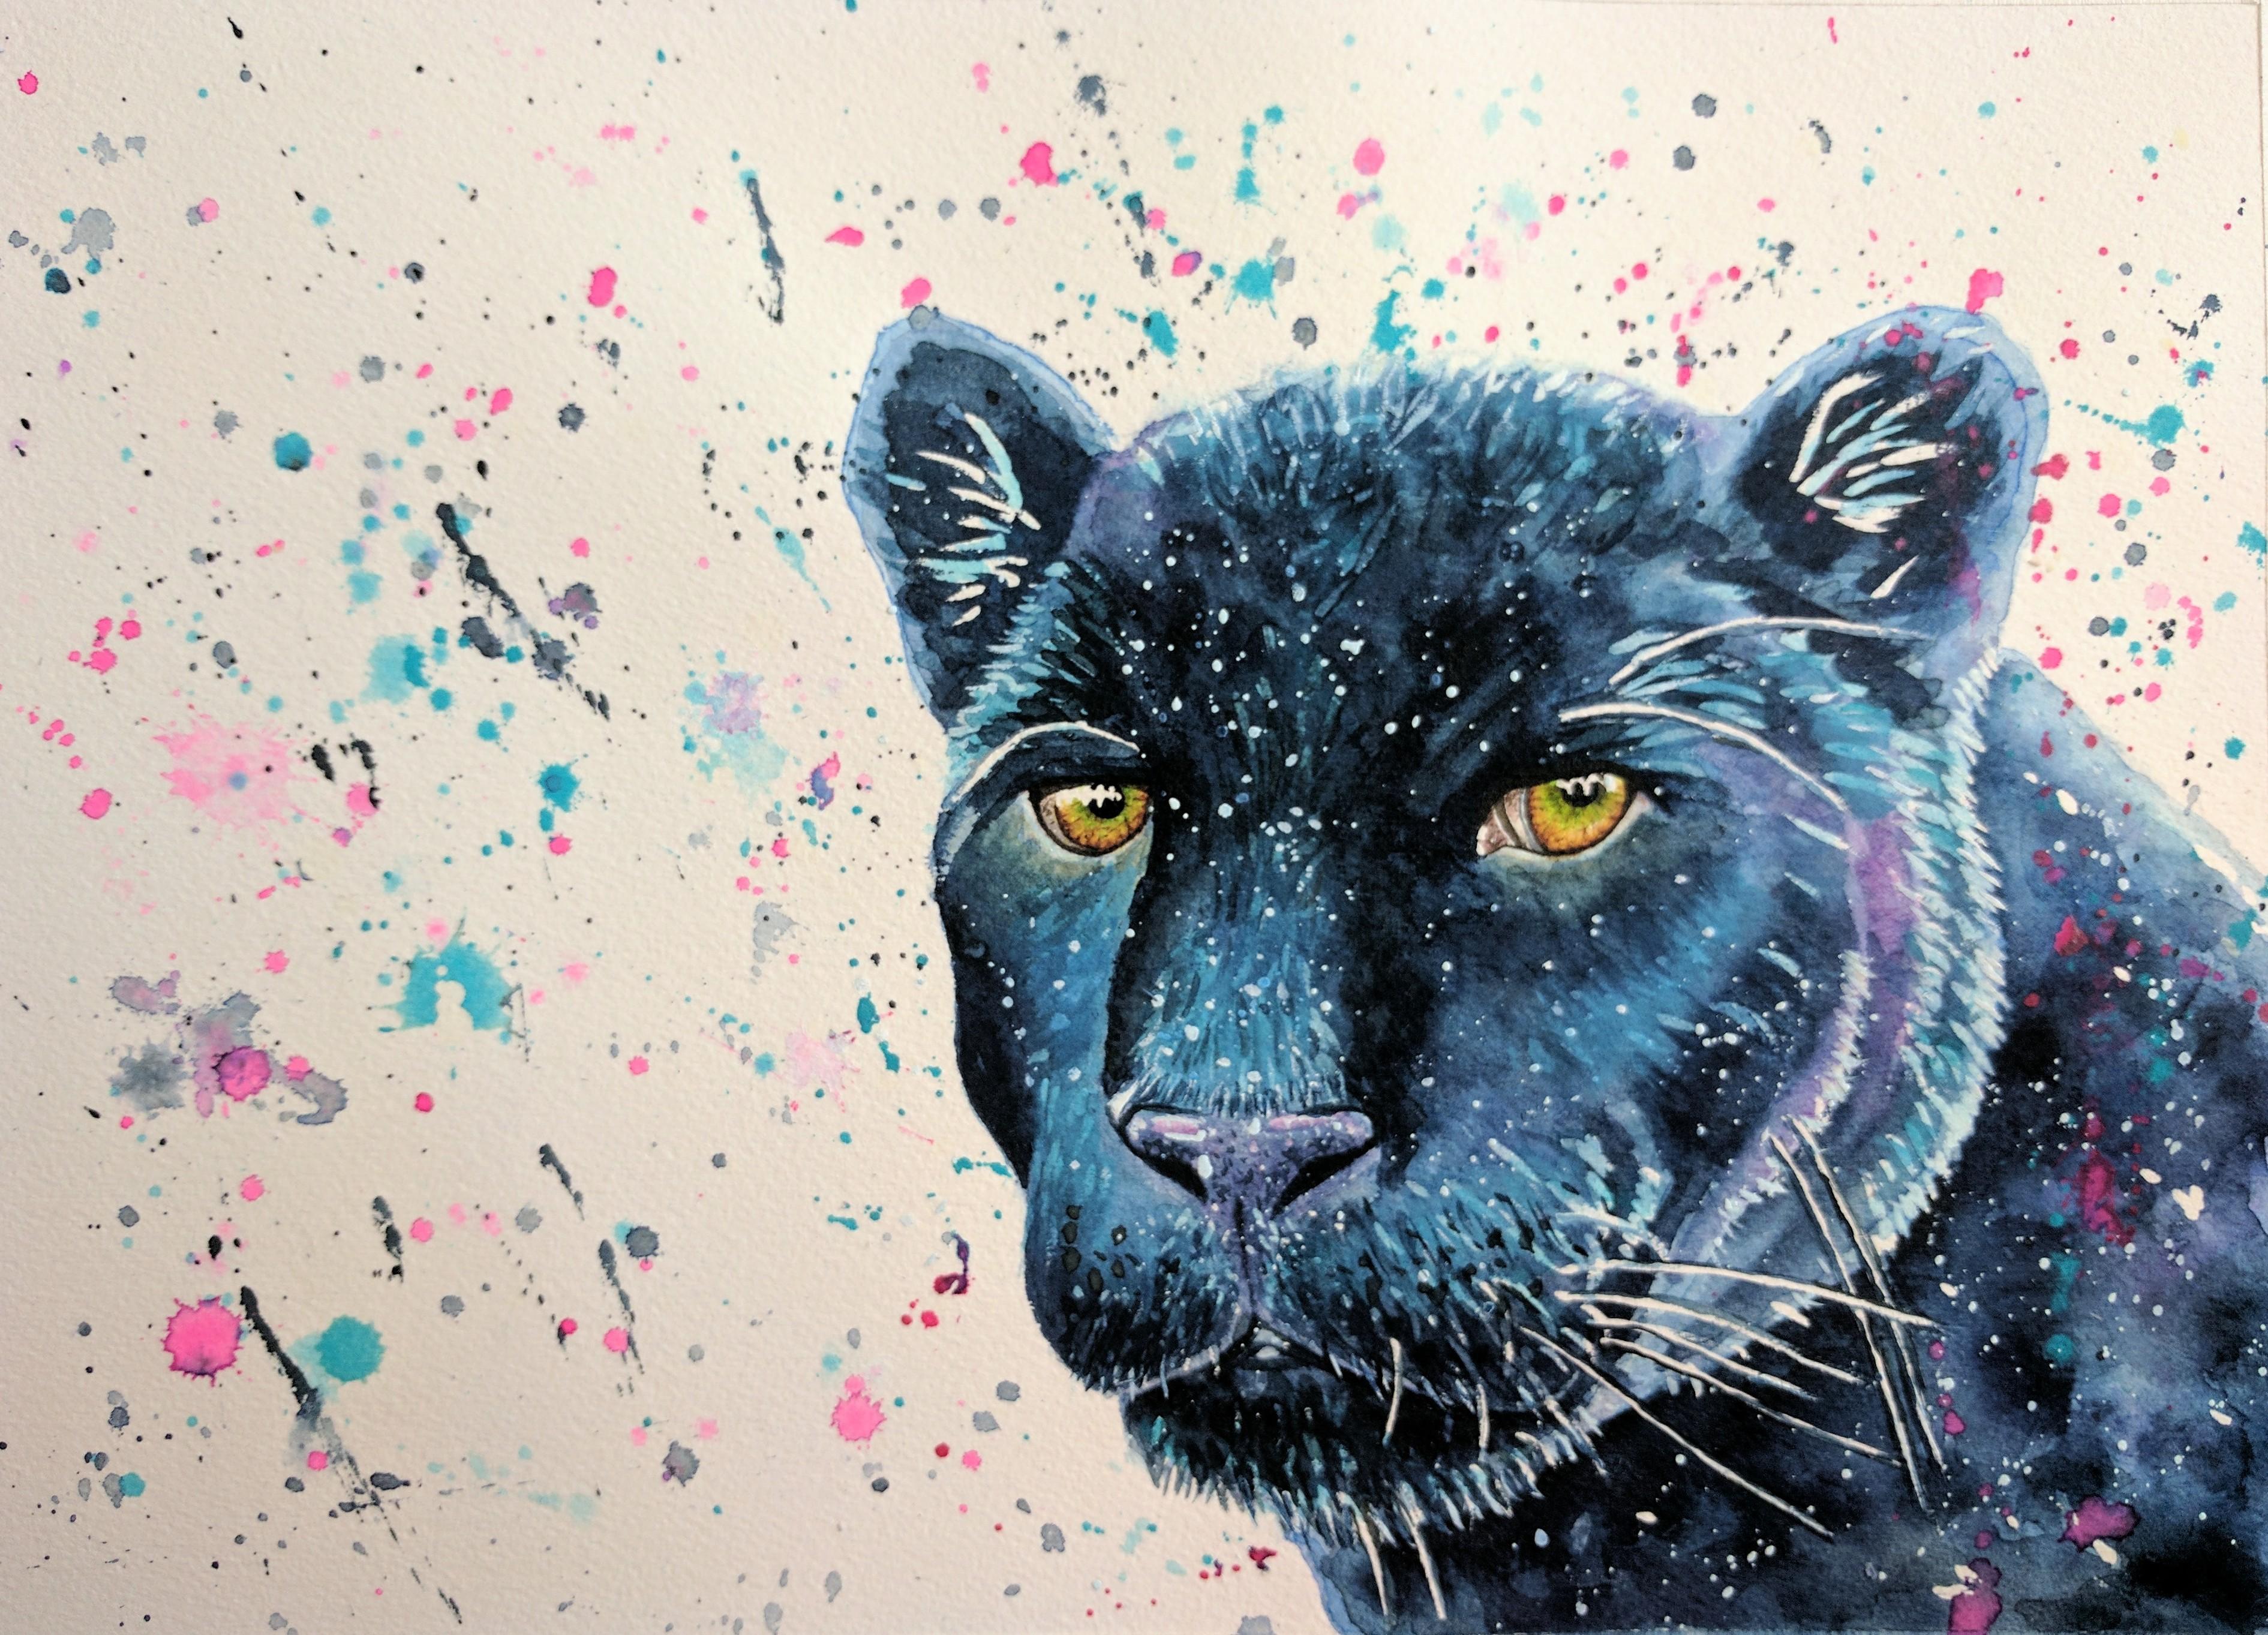 3781x2726 Watercolour Panther